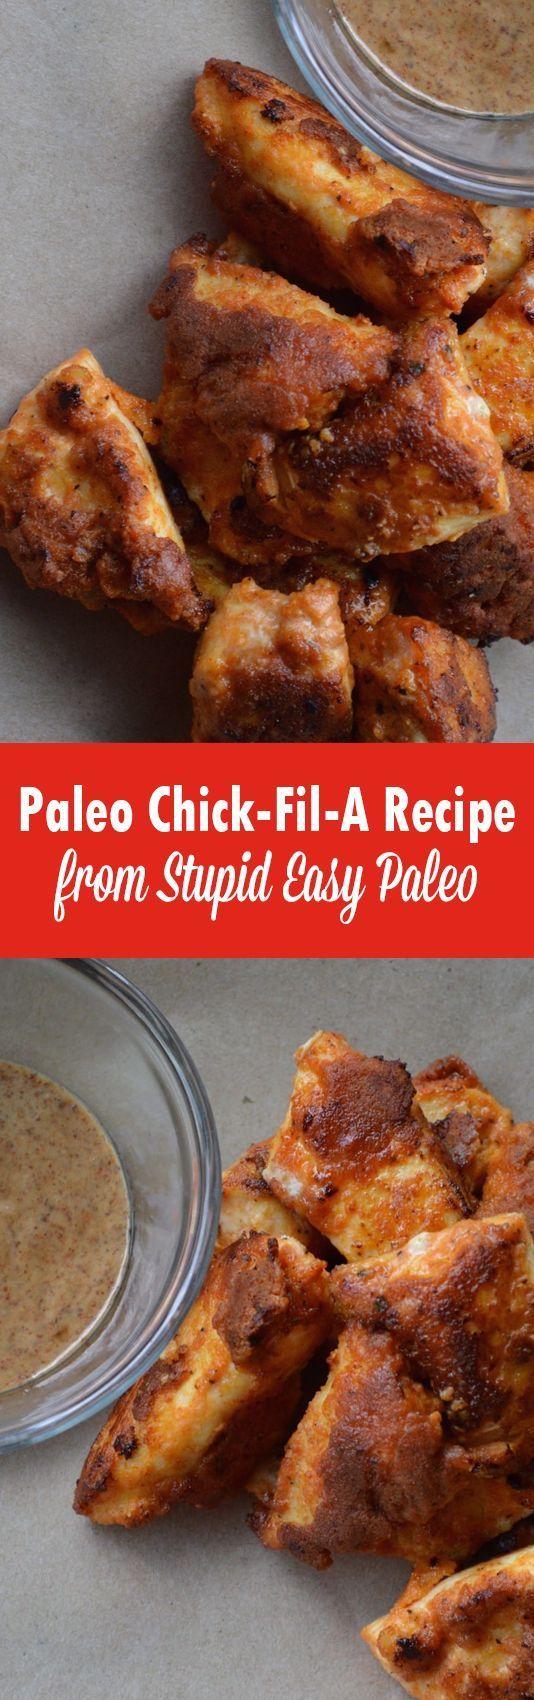 Paleo Chick-Fil-A Recipe | http://StupidEasyPaleo.com